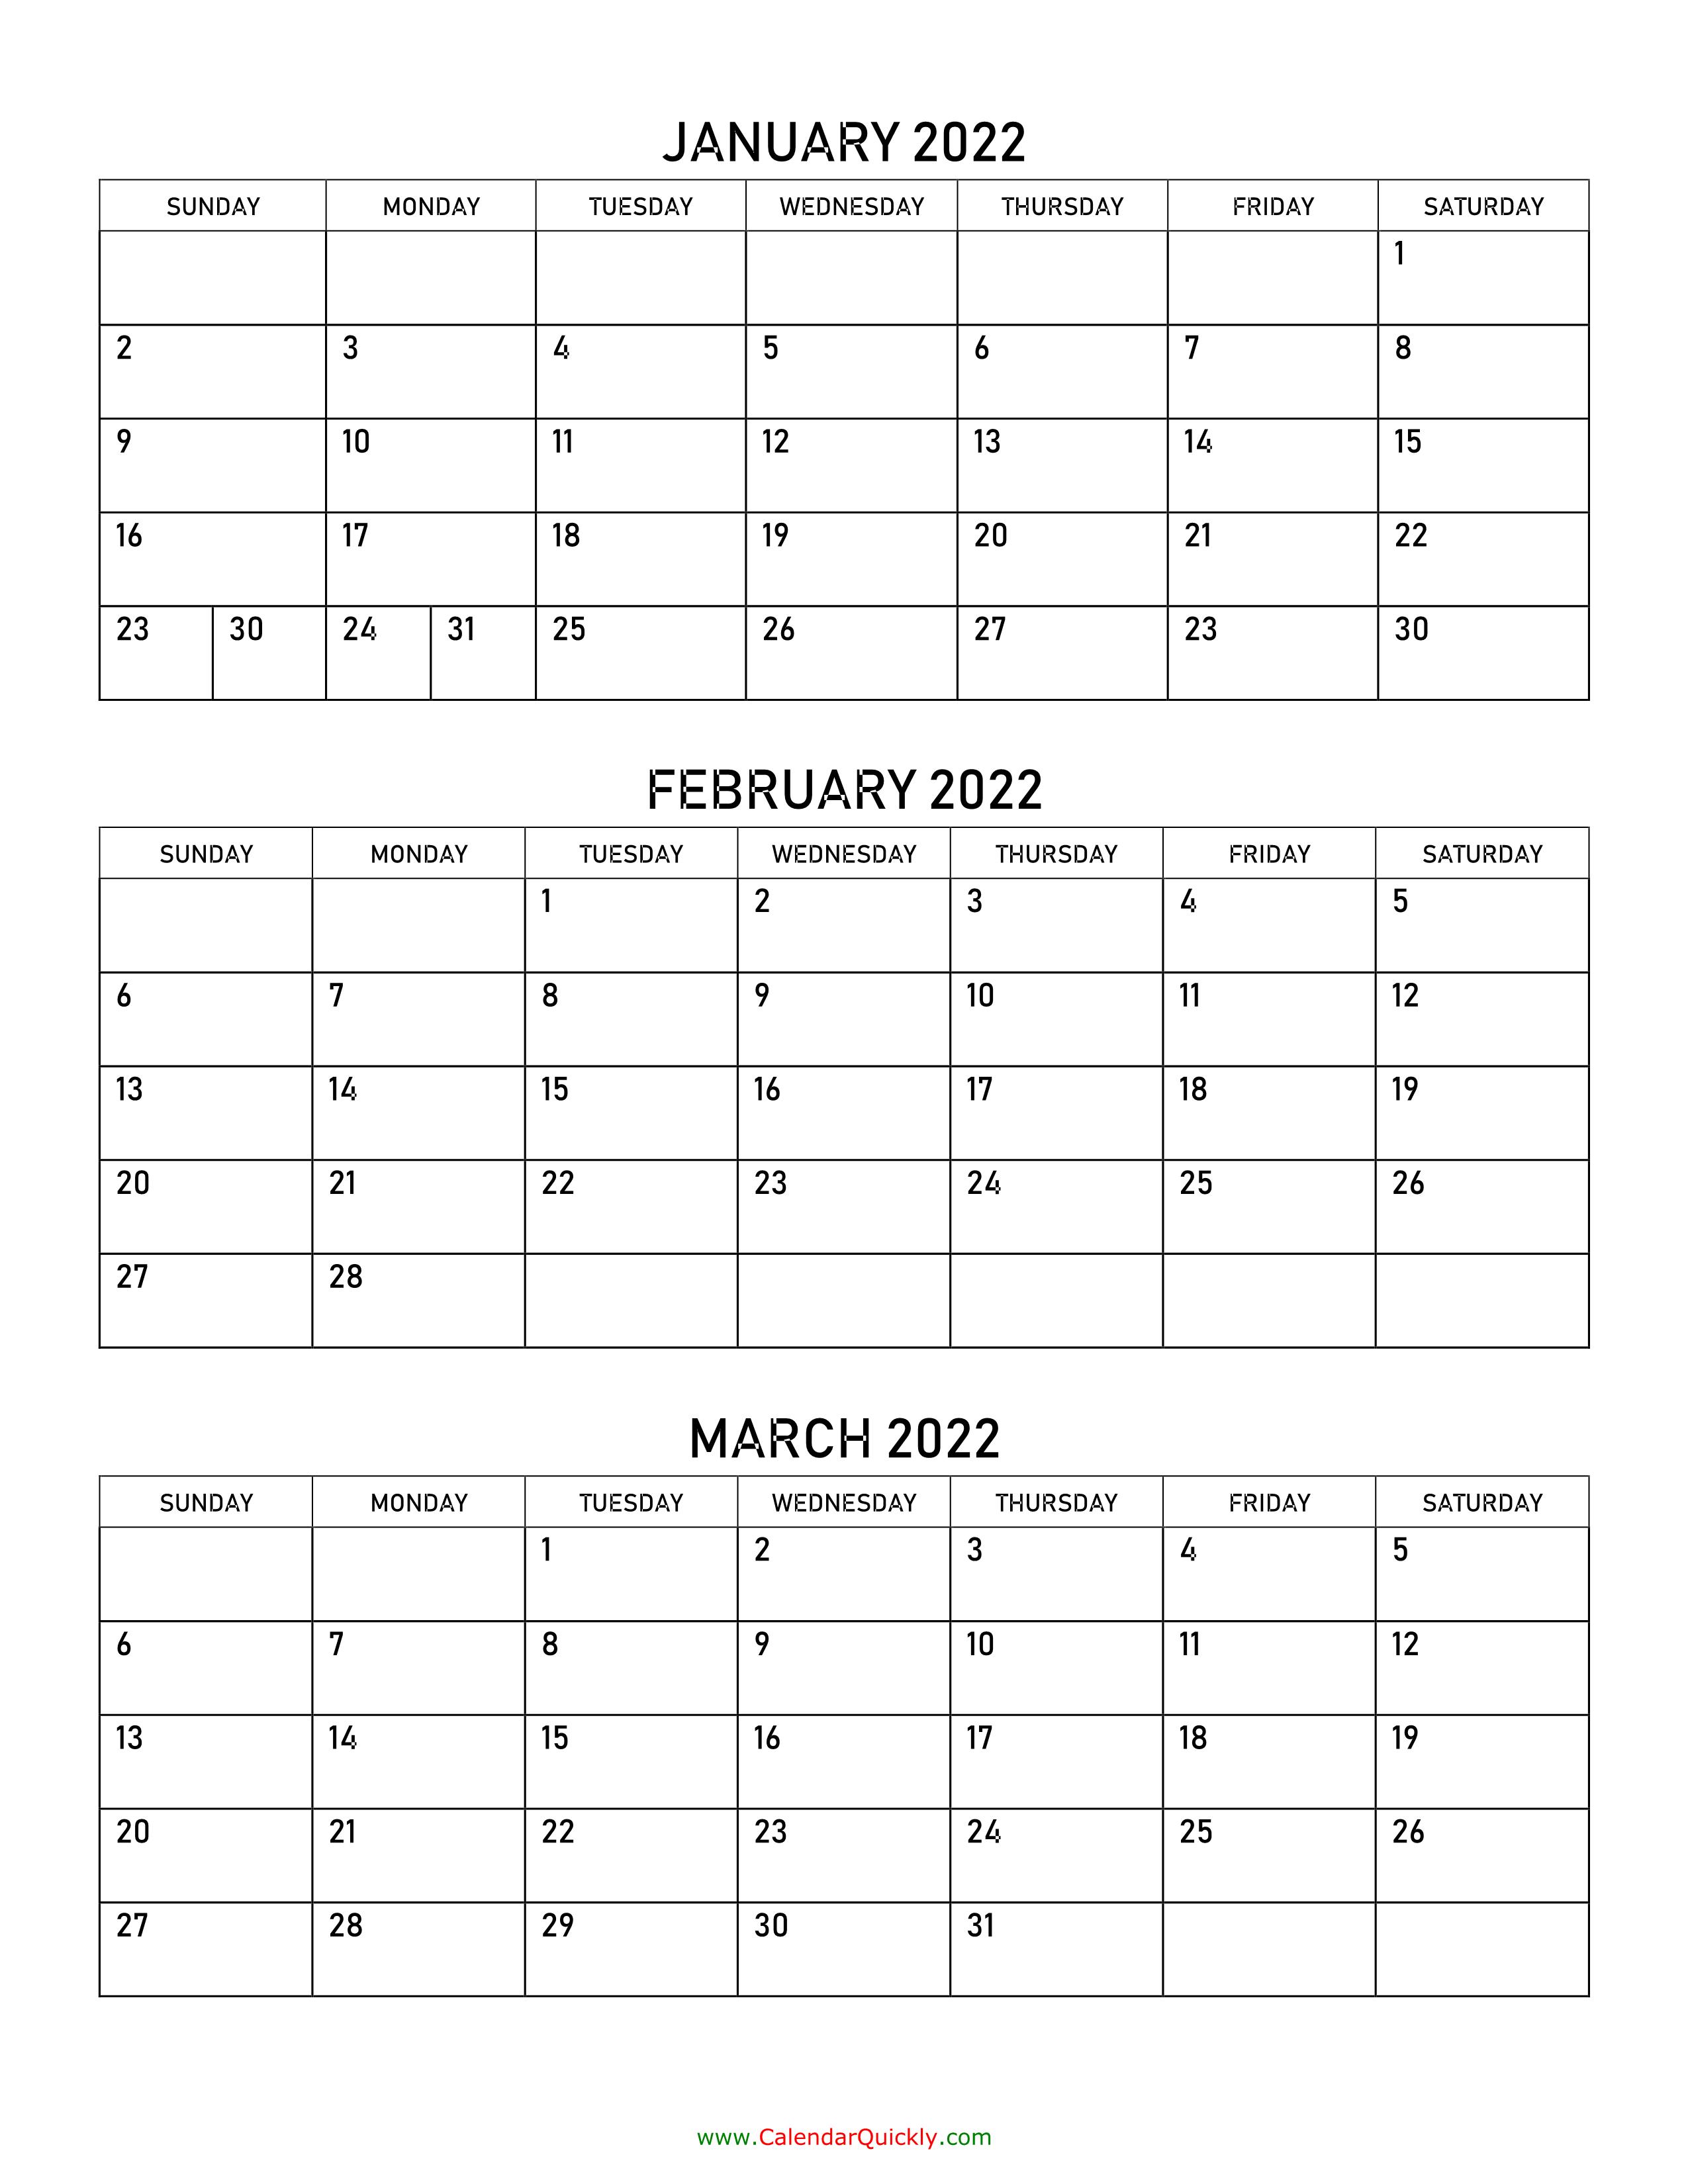 January To March 2022 Calendar   Calendar Quickly Regarding March And April 2022 Calendar Free Printable